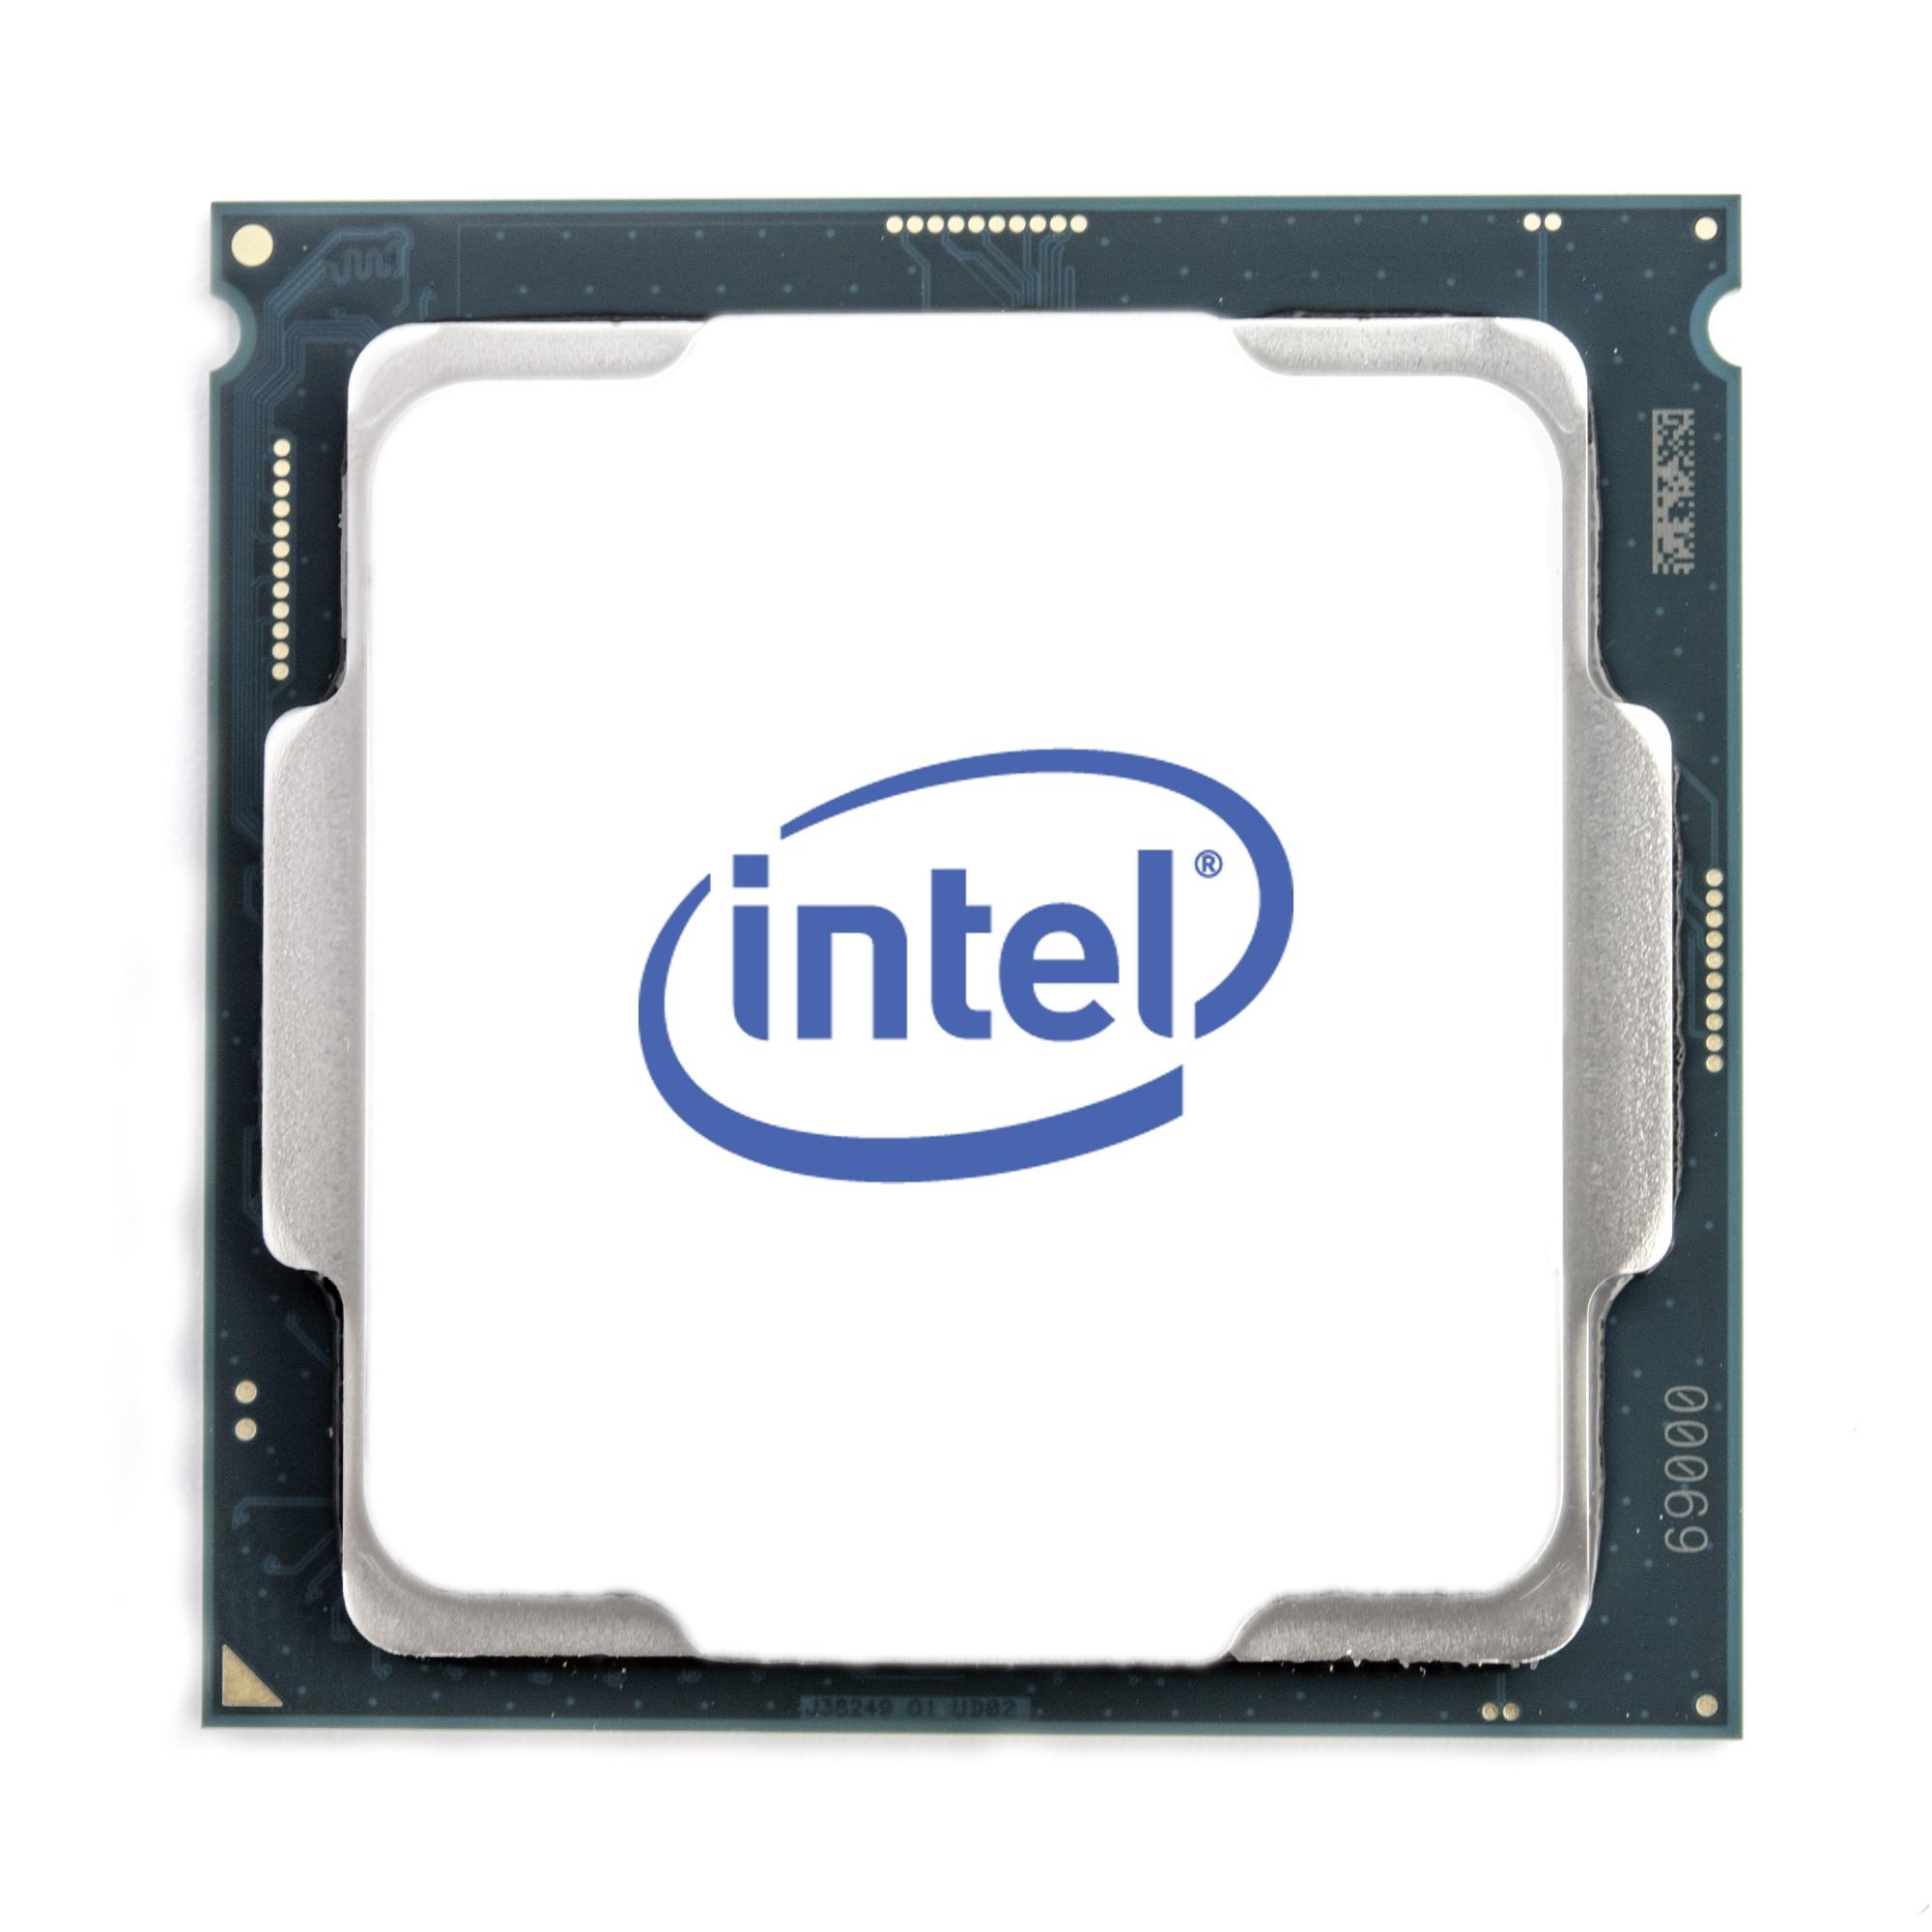 Intel Core i5-10400F processor 2.9 GHz 12 MB Smart Cache